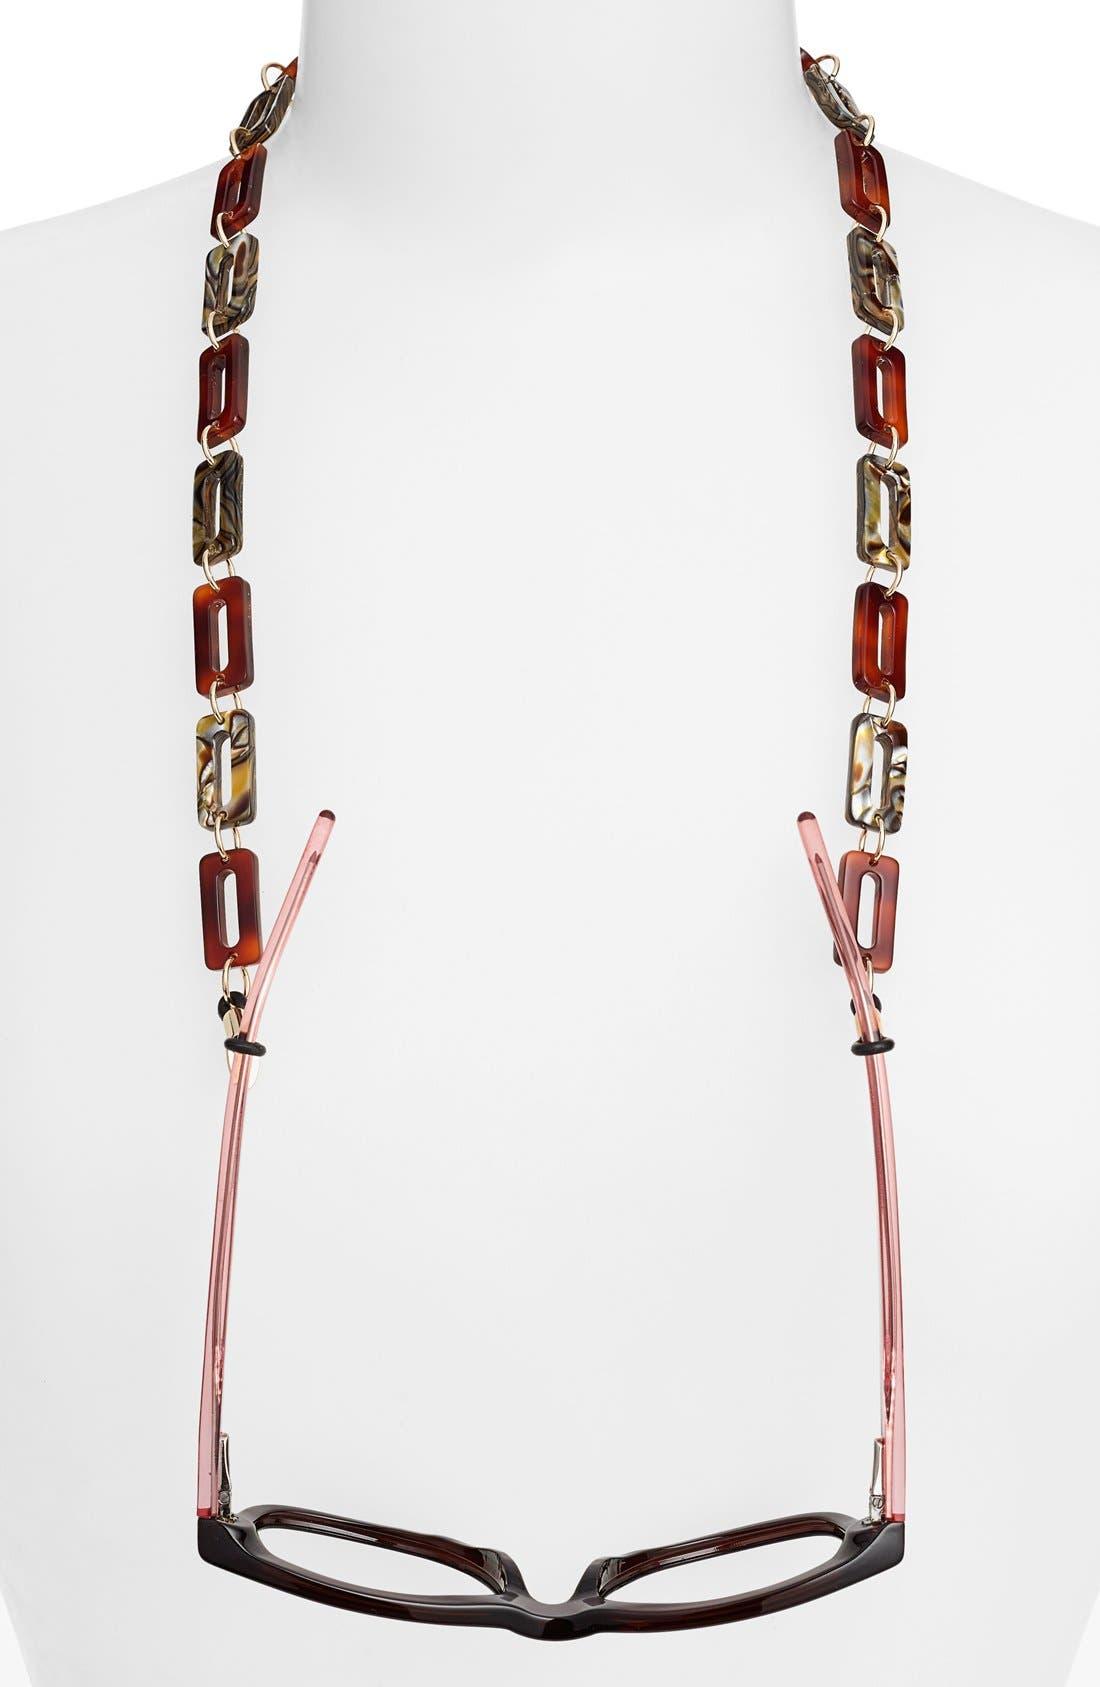 L. Erickson 'Mim Mod' Eyewear Chain